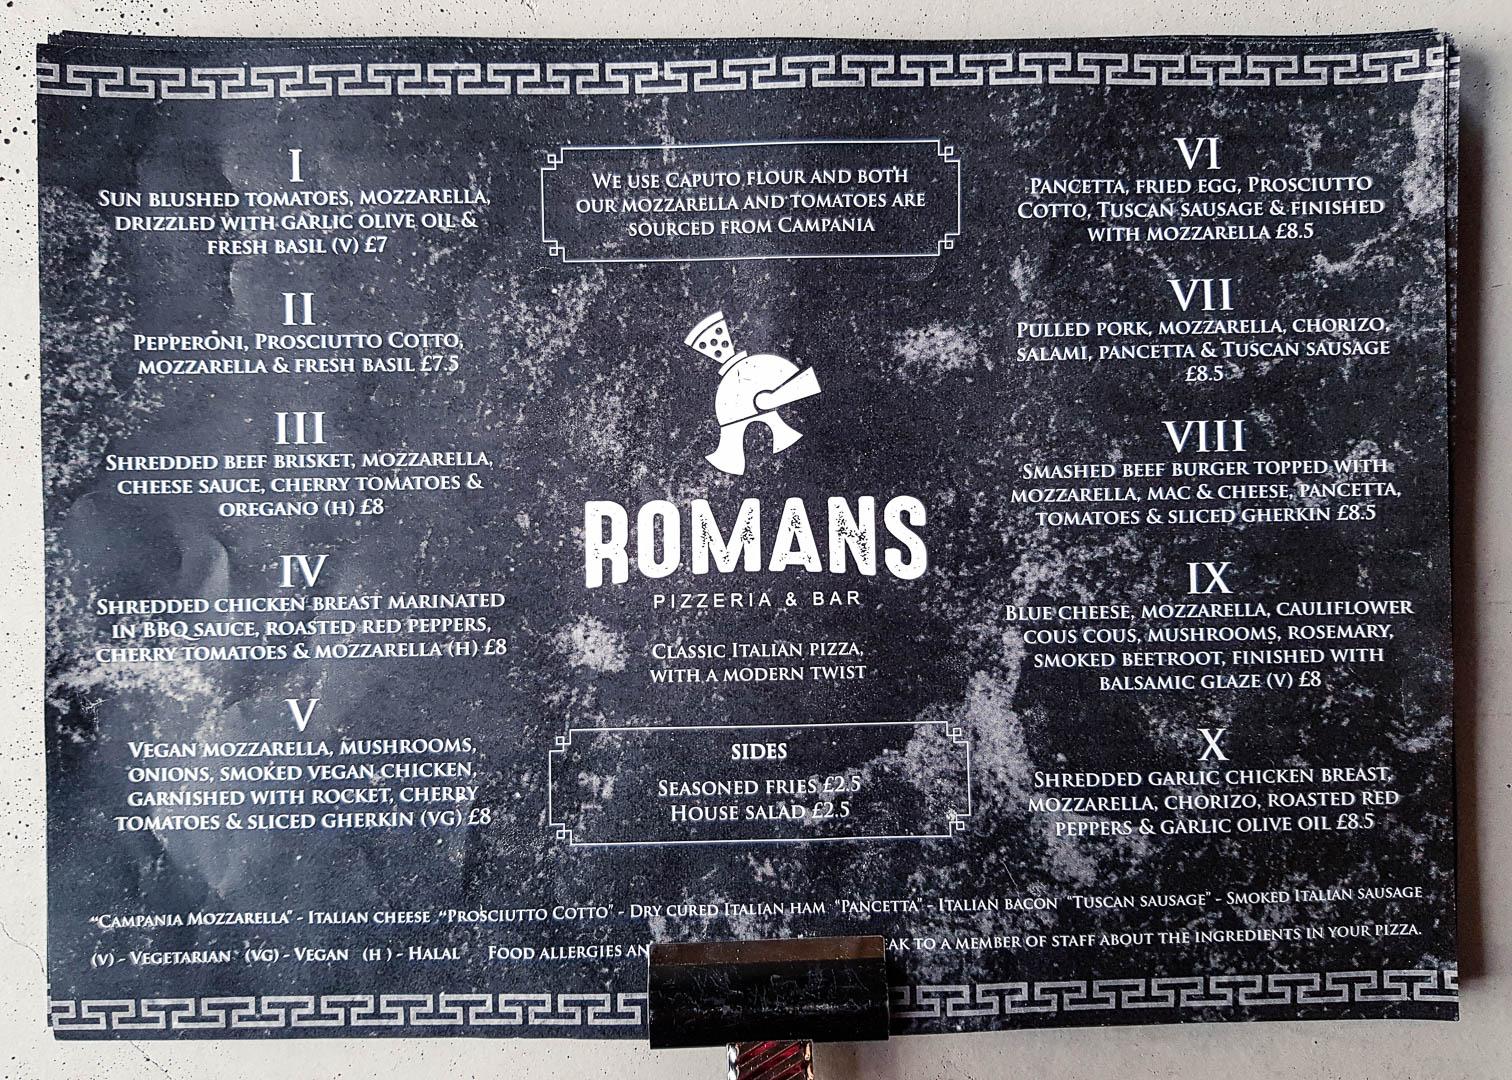 The full menu at the new vegan-friendly restaurant Romans Pizzeria Glasgow.